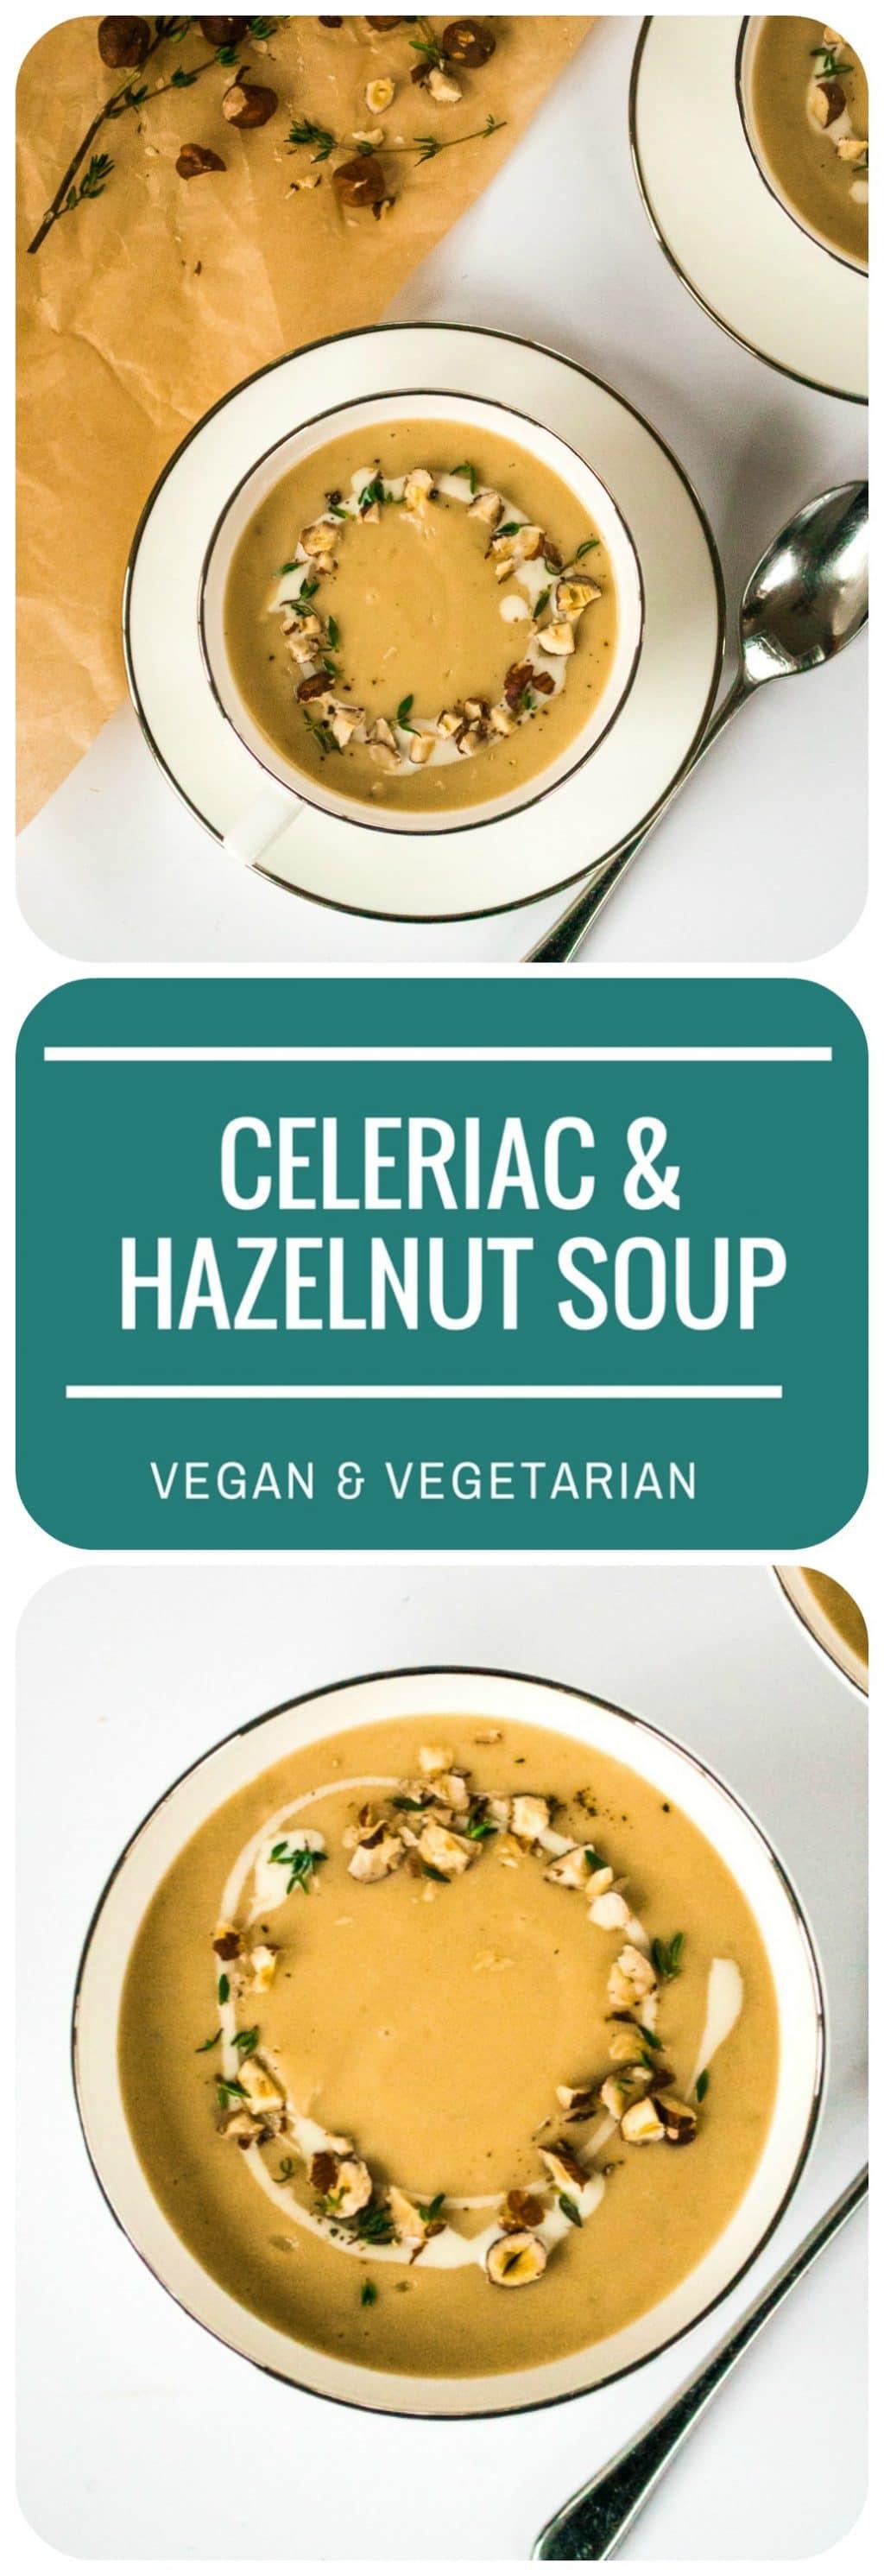 Celeriac & Hazelnut Soup | Vegan & Vegetarian